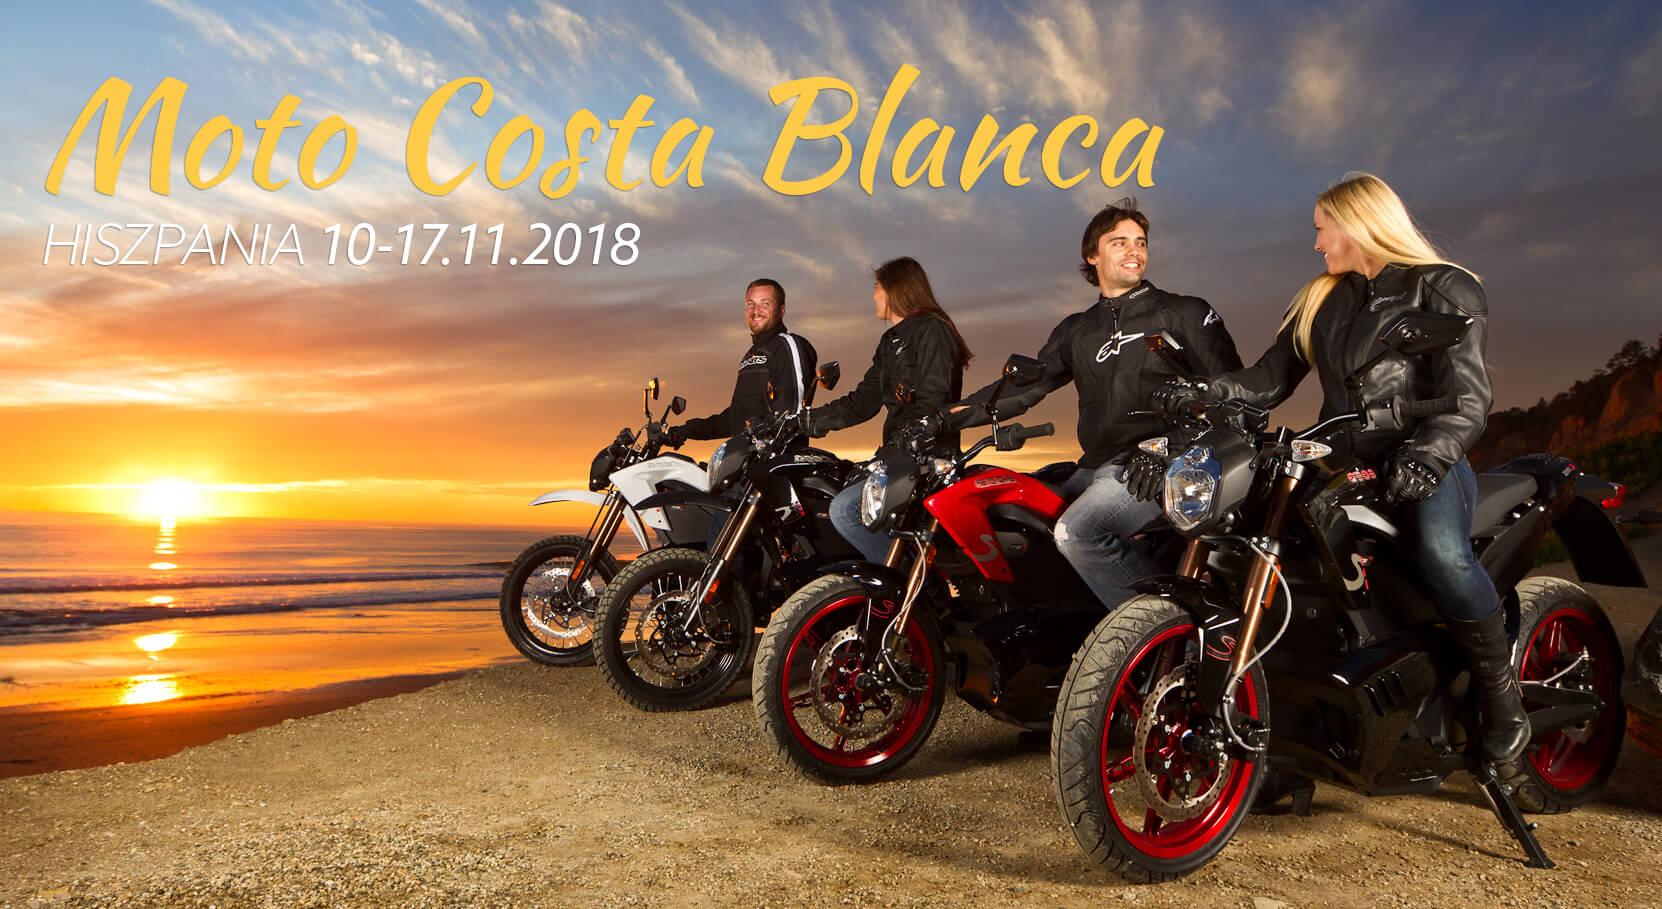 Hiszpania – MotoCosta Blanca – 10-17.11.2018